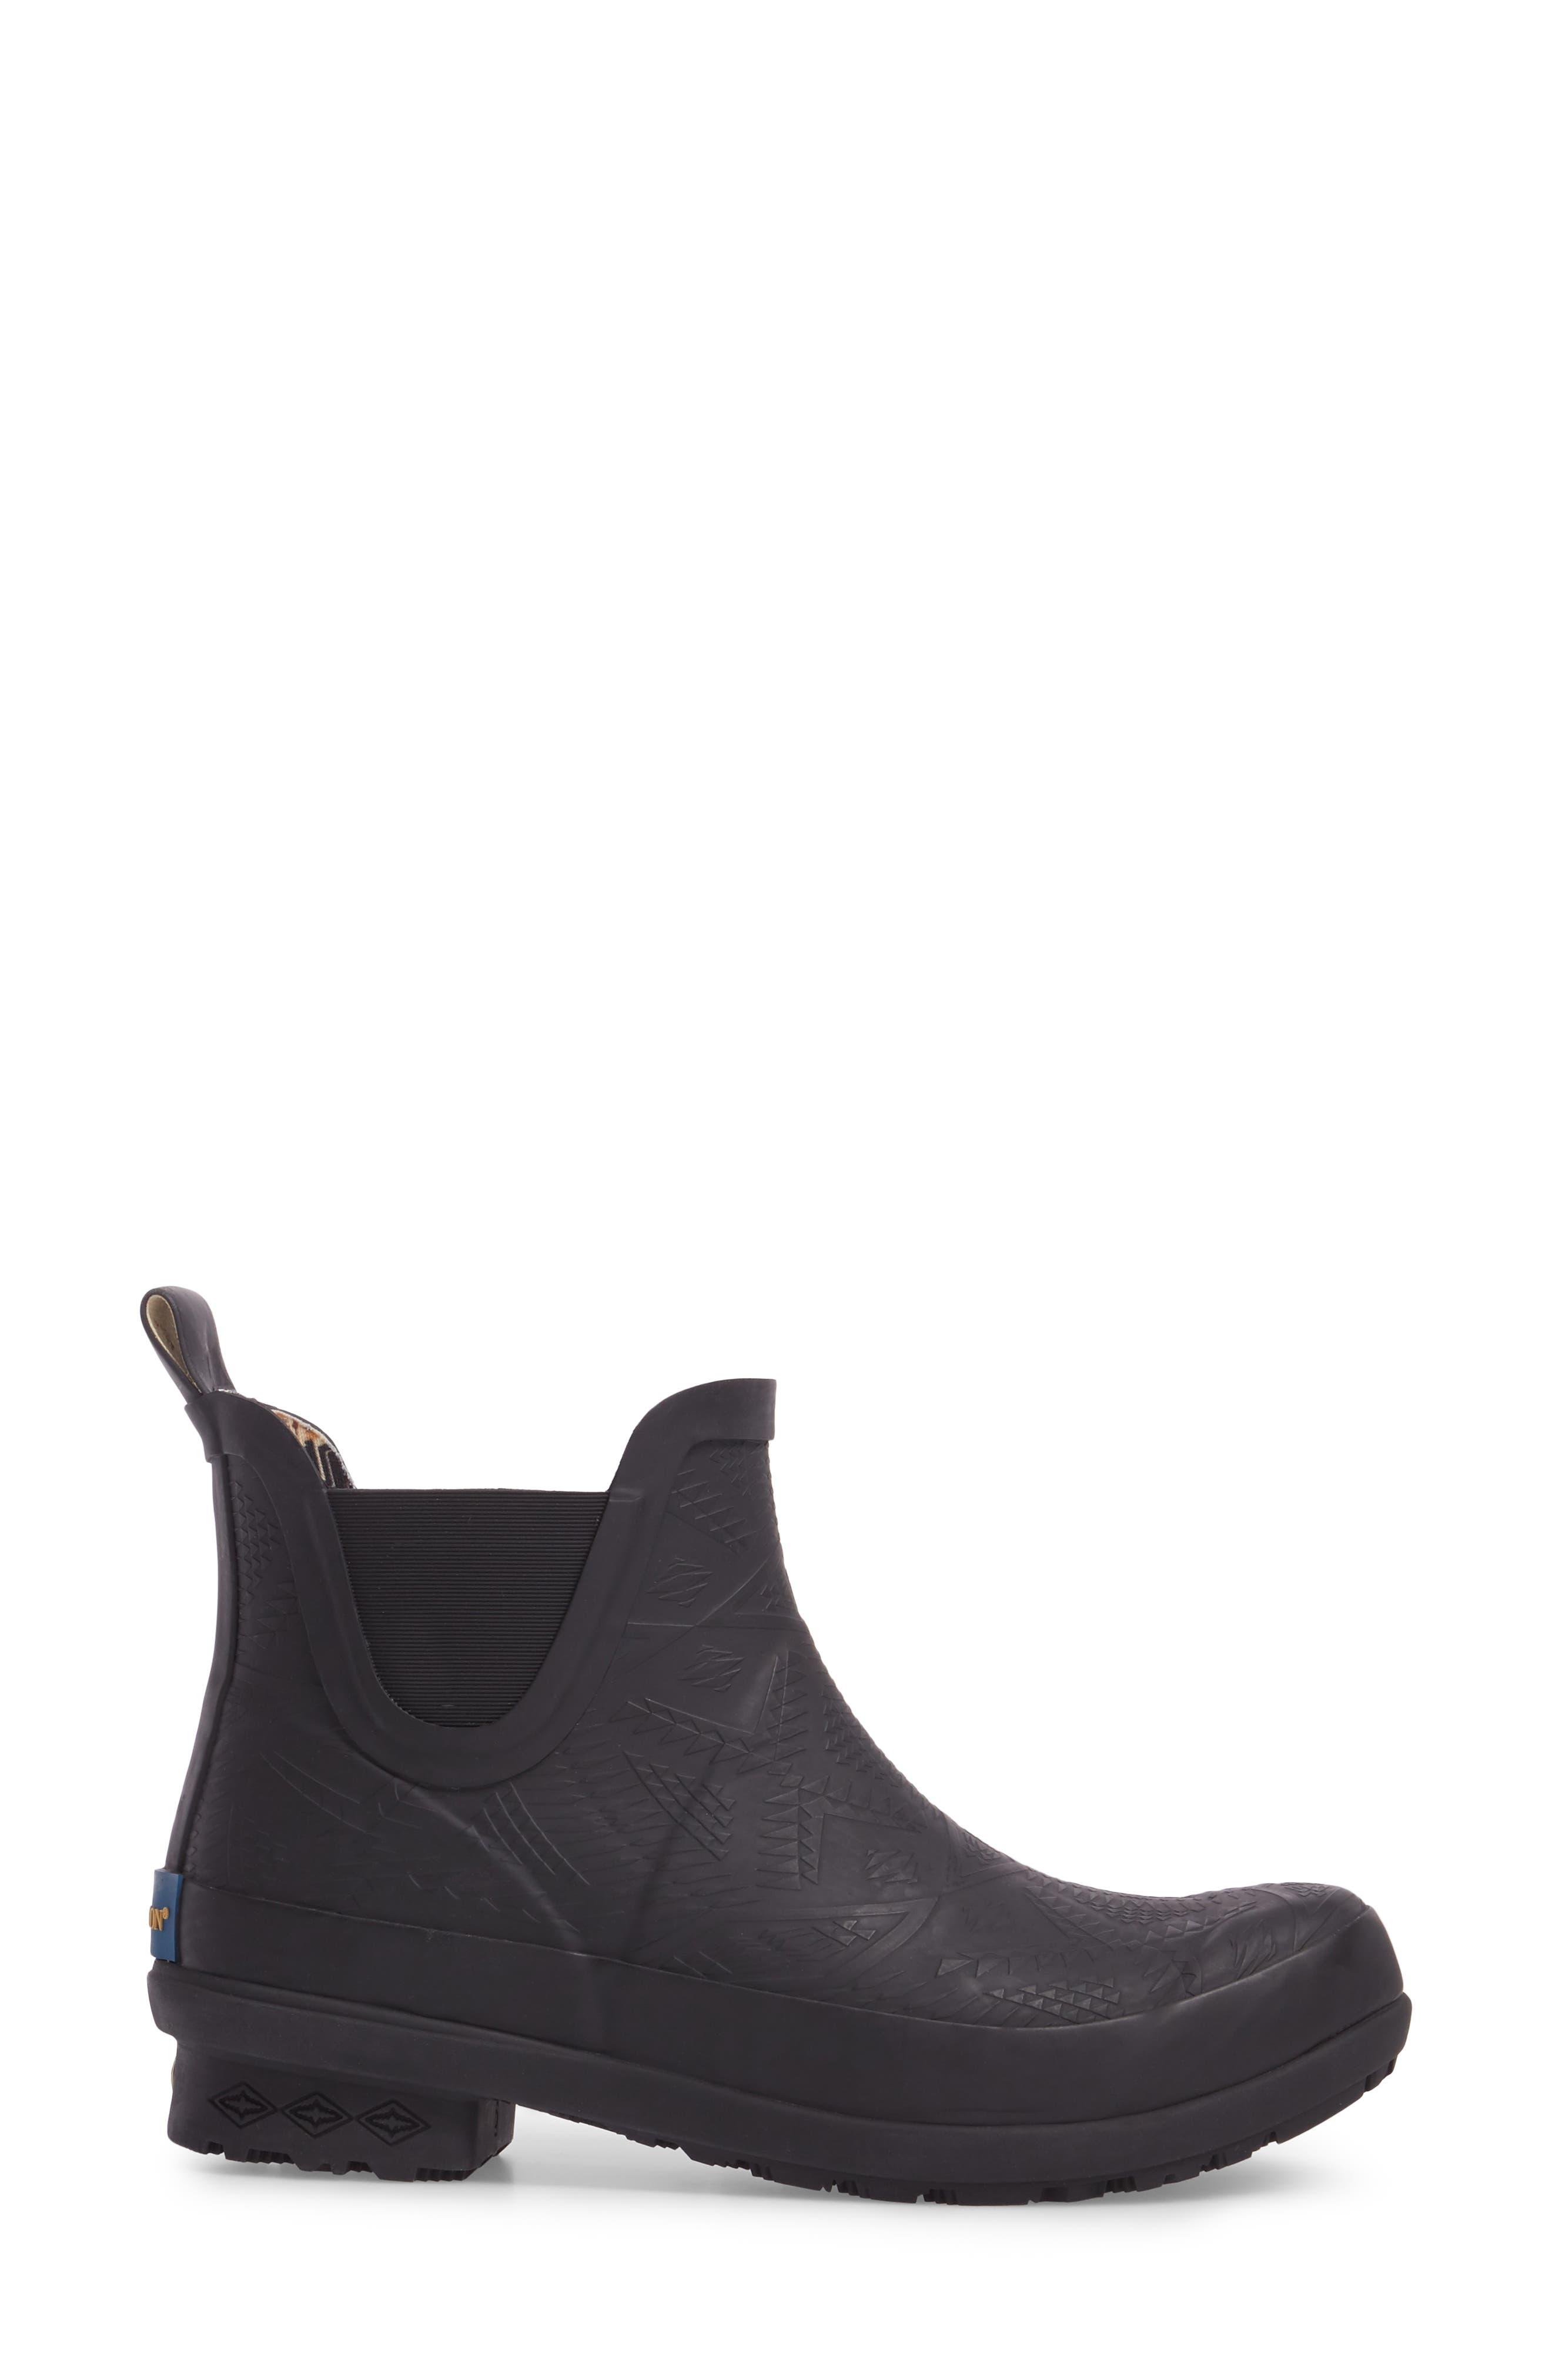 PENDLETON, Embossed Chelsea Rain Boot, Alternate thumbnail 3, color, BLACK